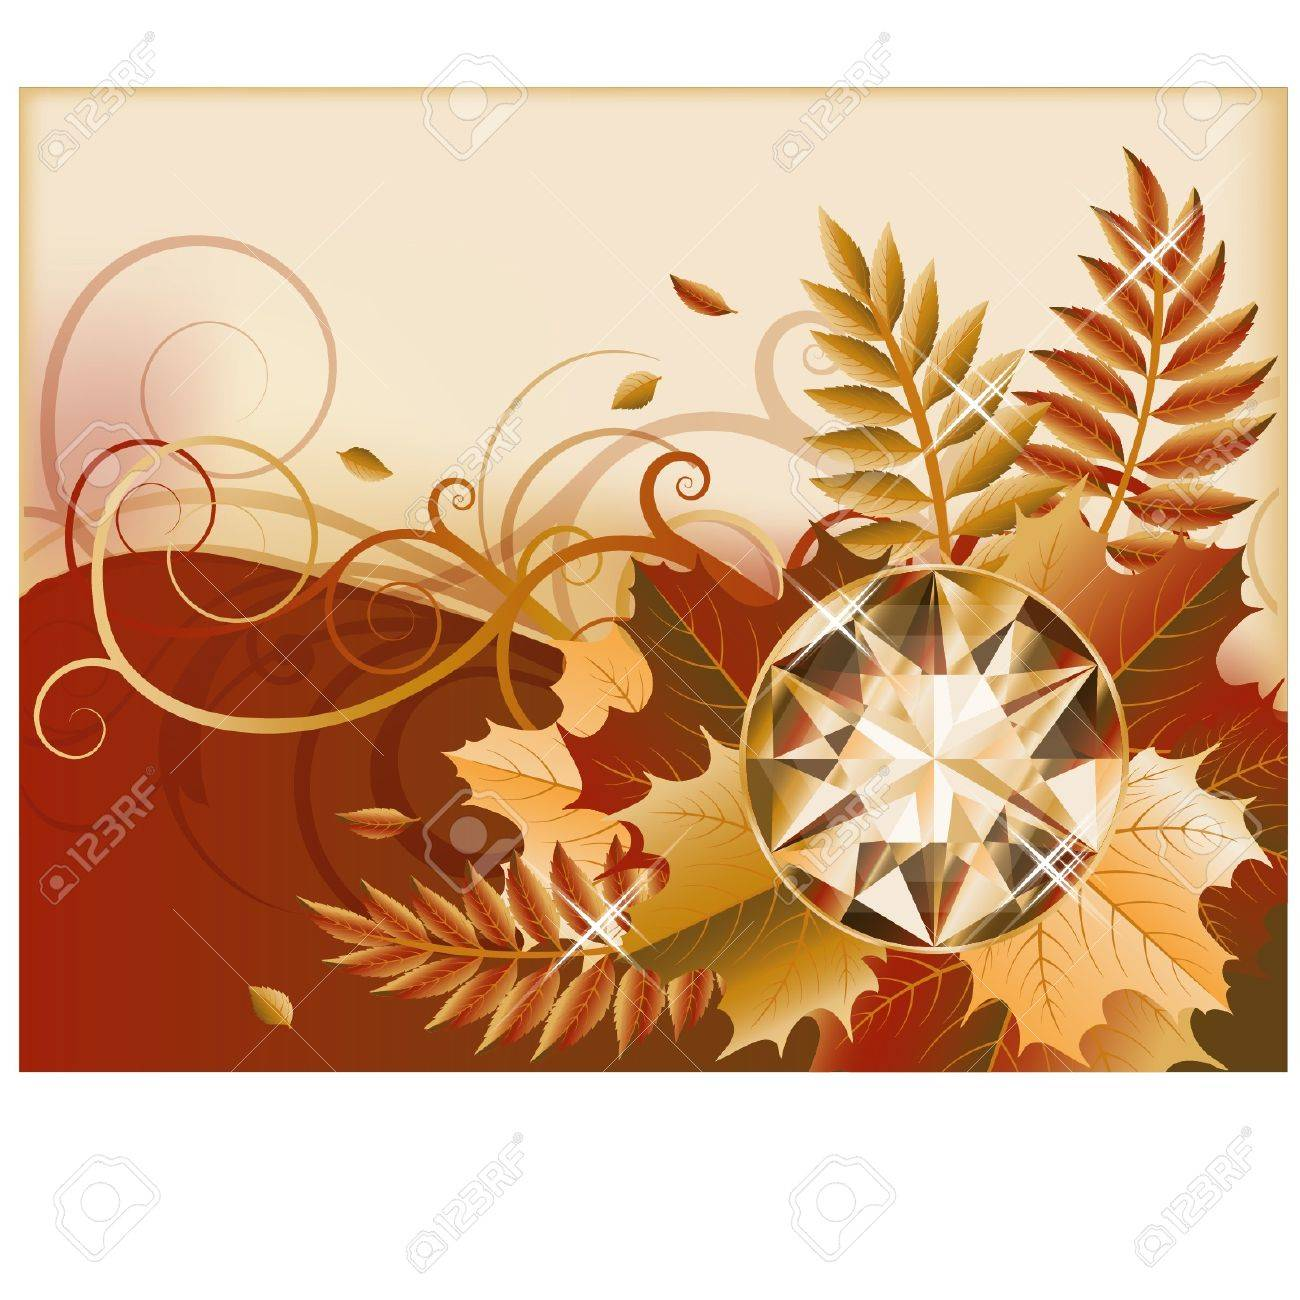 Autumn banner with precious gemstone, vector illustration Stock Vector - 21635354